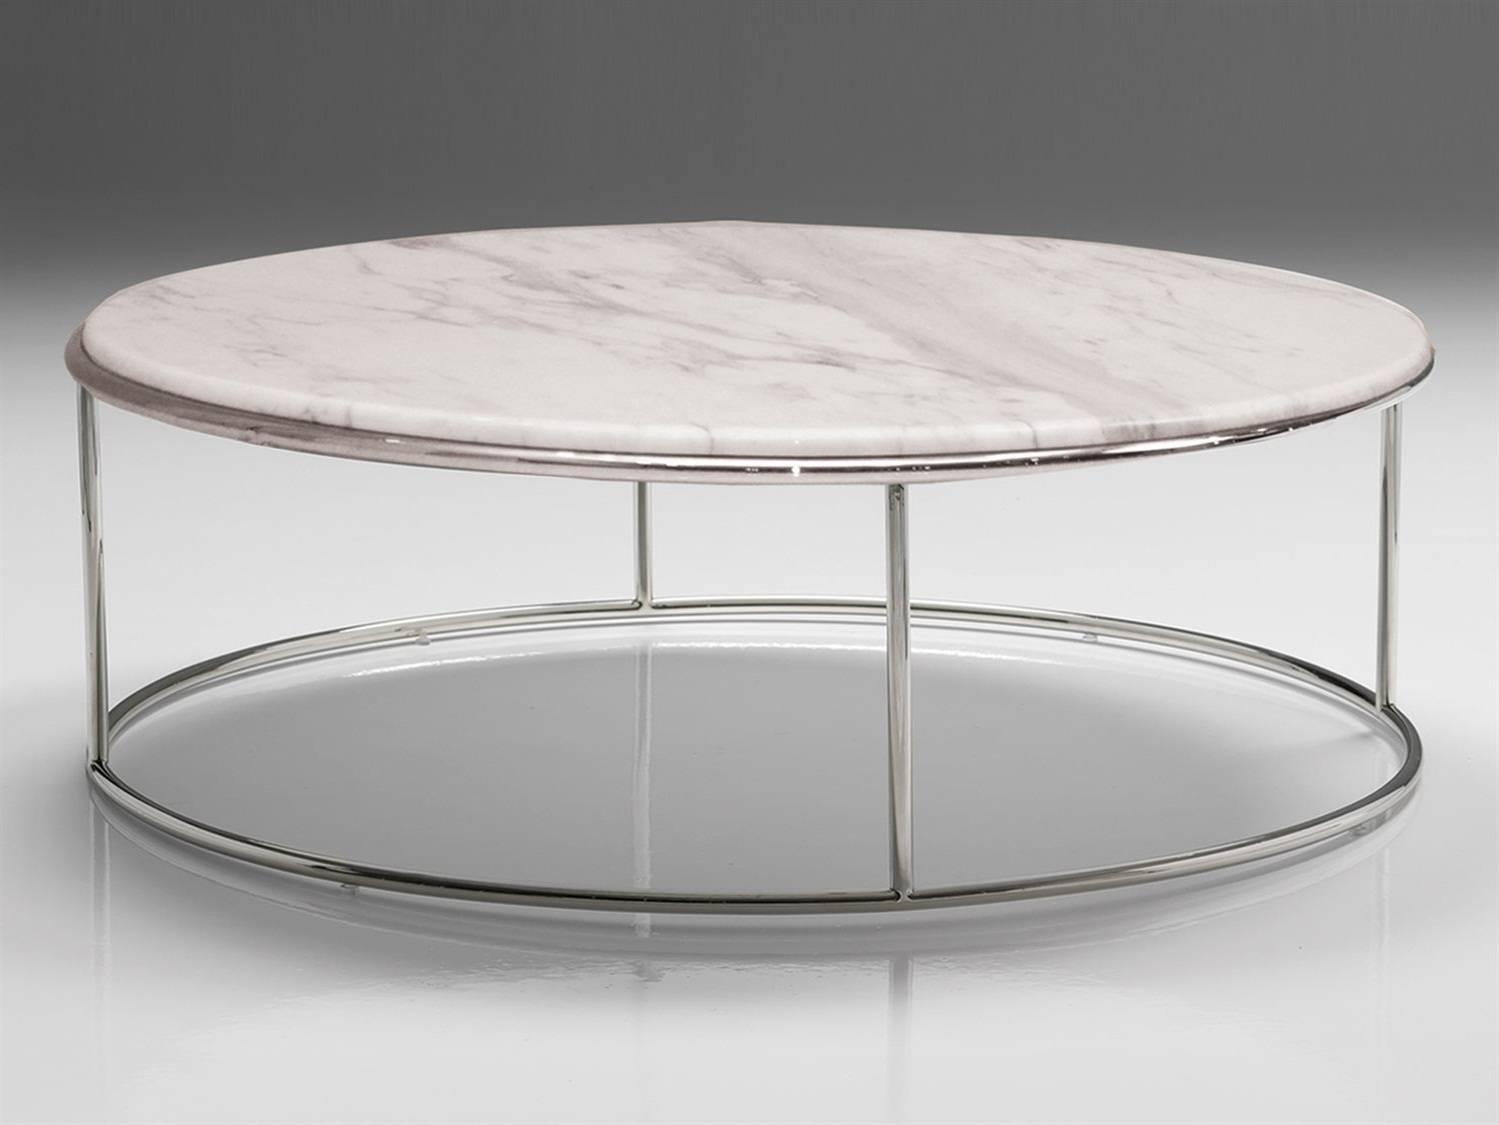 Wonderful Round Coffee Table Furniture – Round Coffee Table inside Marble Round Coffee Tables (Image 30 of 30)